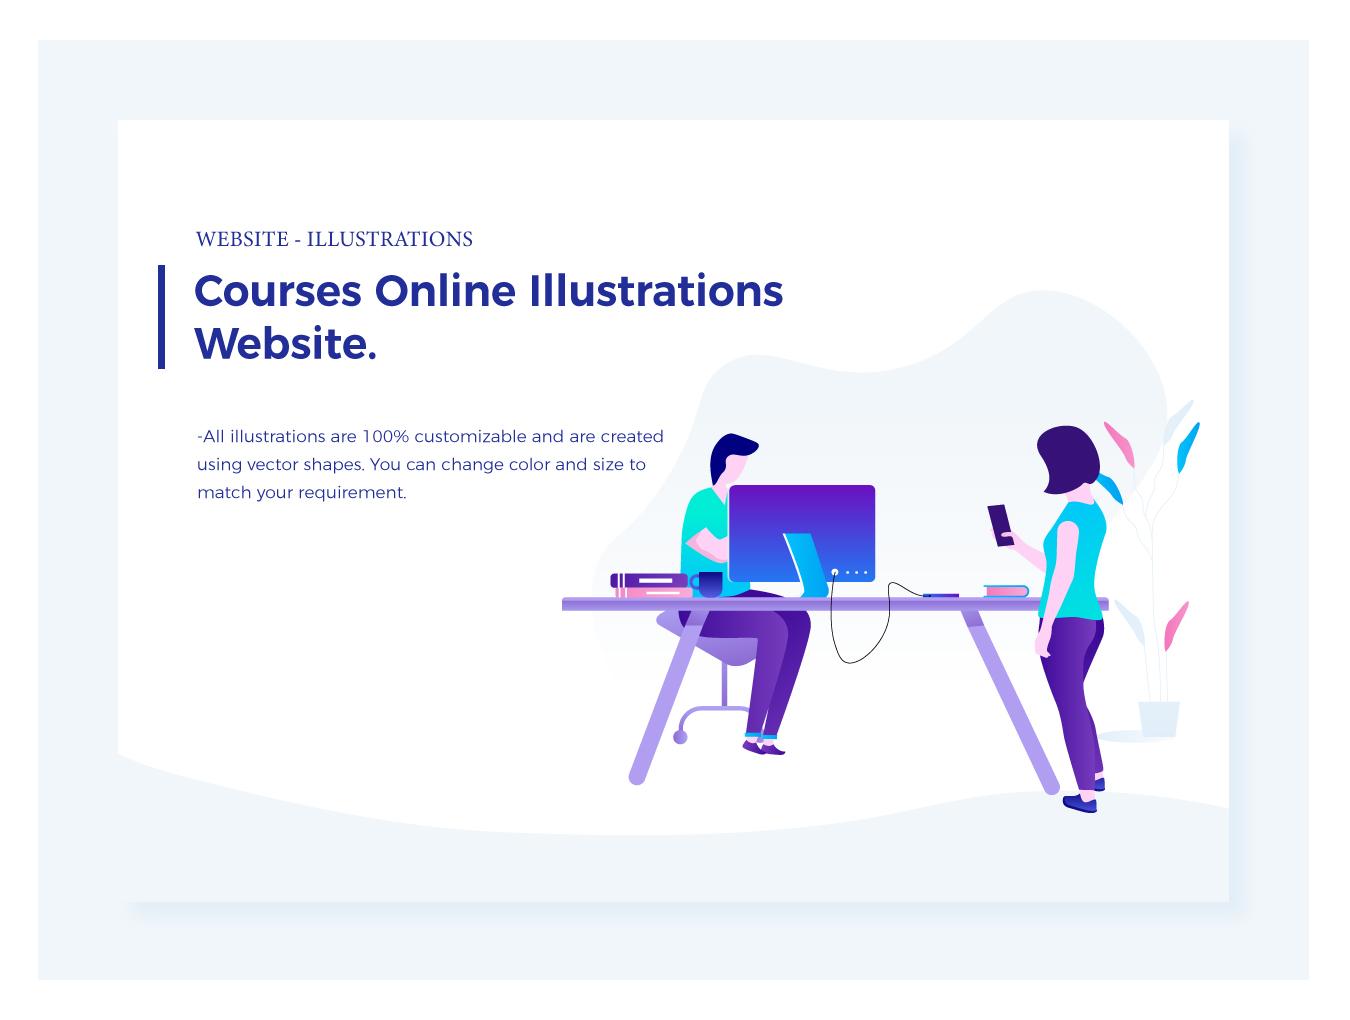 WEB端后台数据插画 Marketing & Courses Illustrations